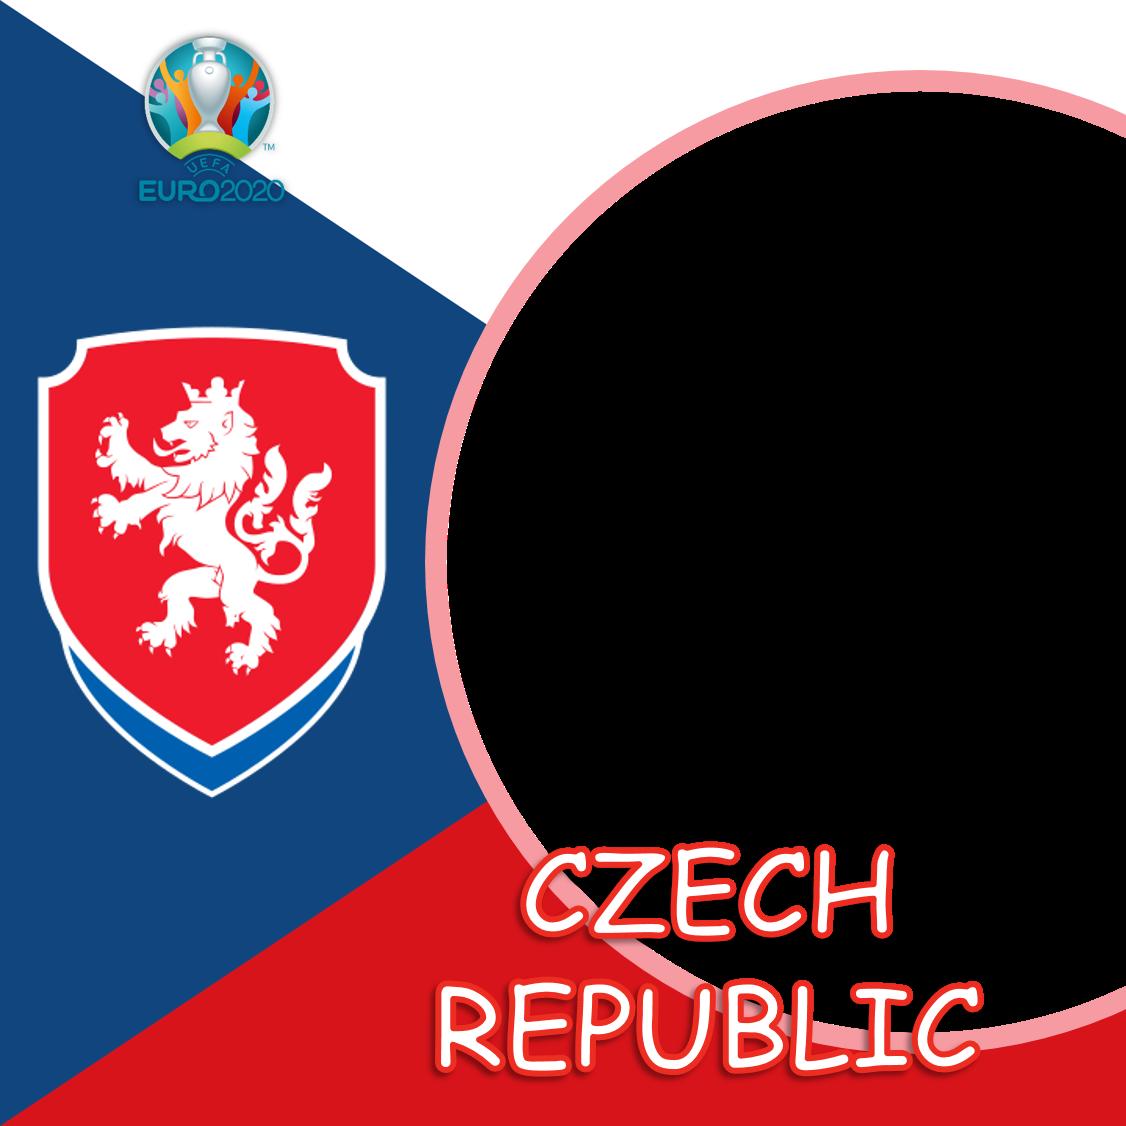 Background Bingkai Foto Twibbon Republik Ceko Euro 2020 - Czech Republic Euro 2021